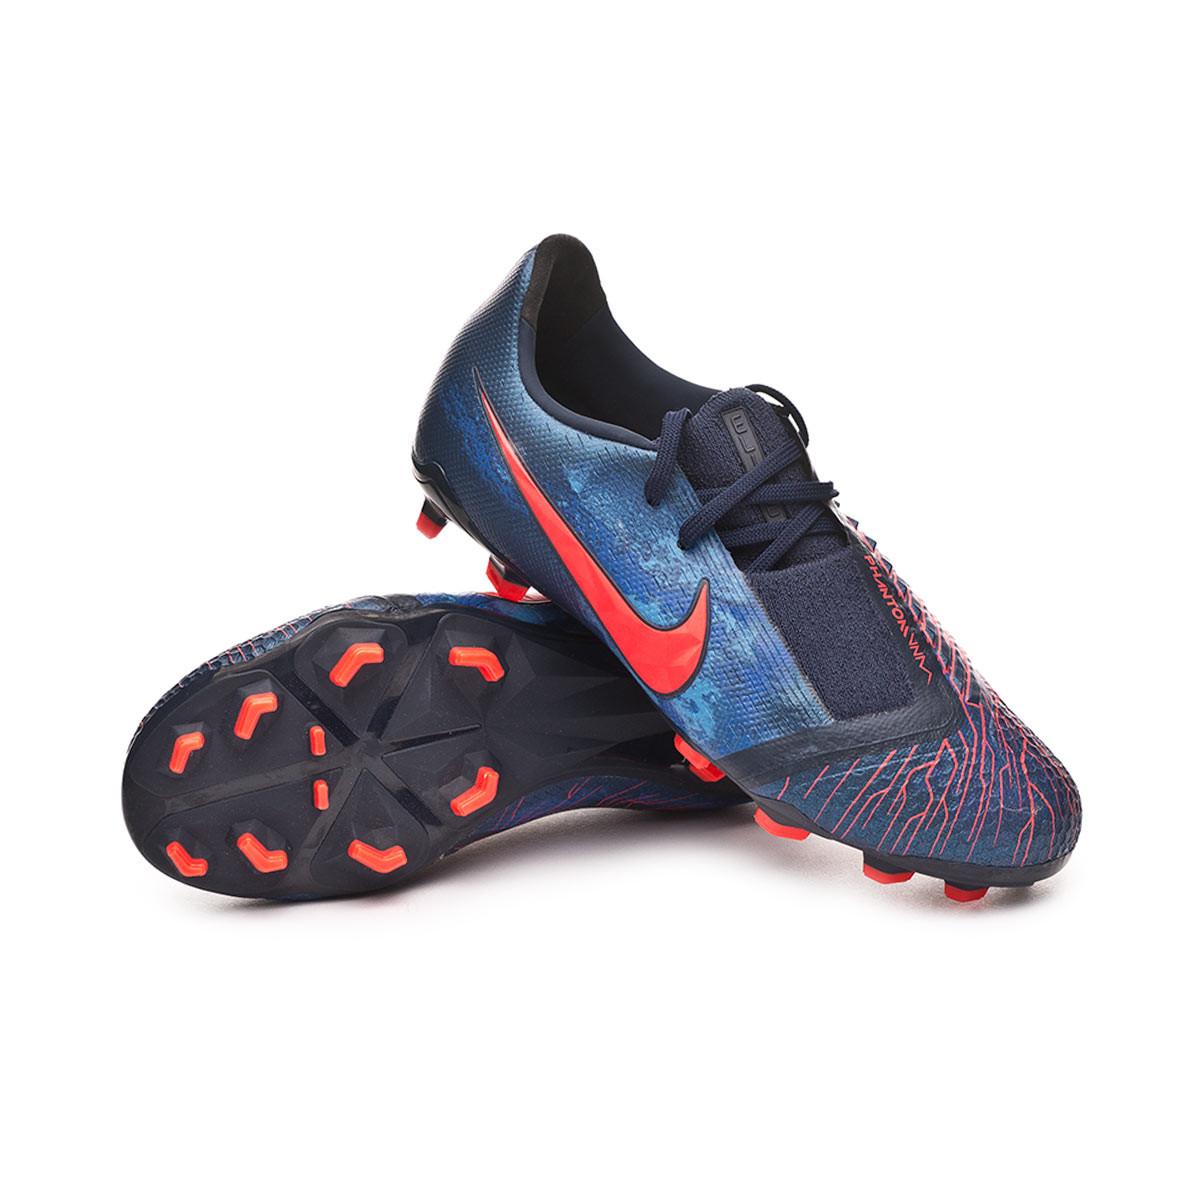 724bfd733 Football Boots Nike Kids Phantom Venom Elite FG Obsidian-White-Black-Racer  blue - Football store Fútbol Emotion